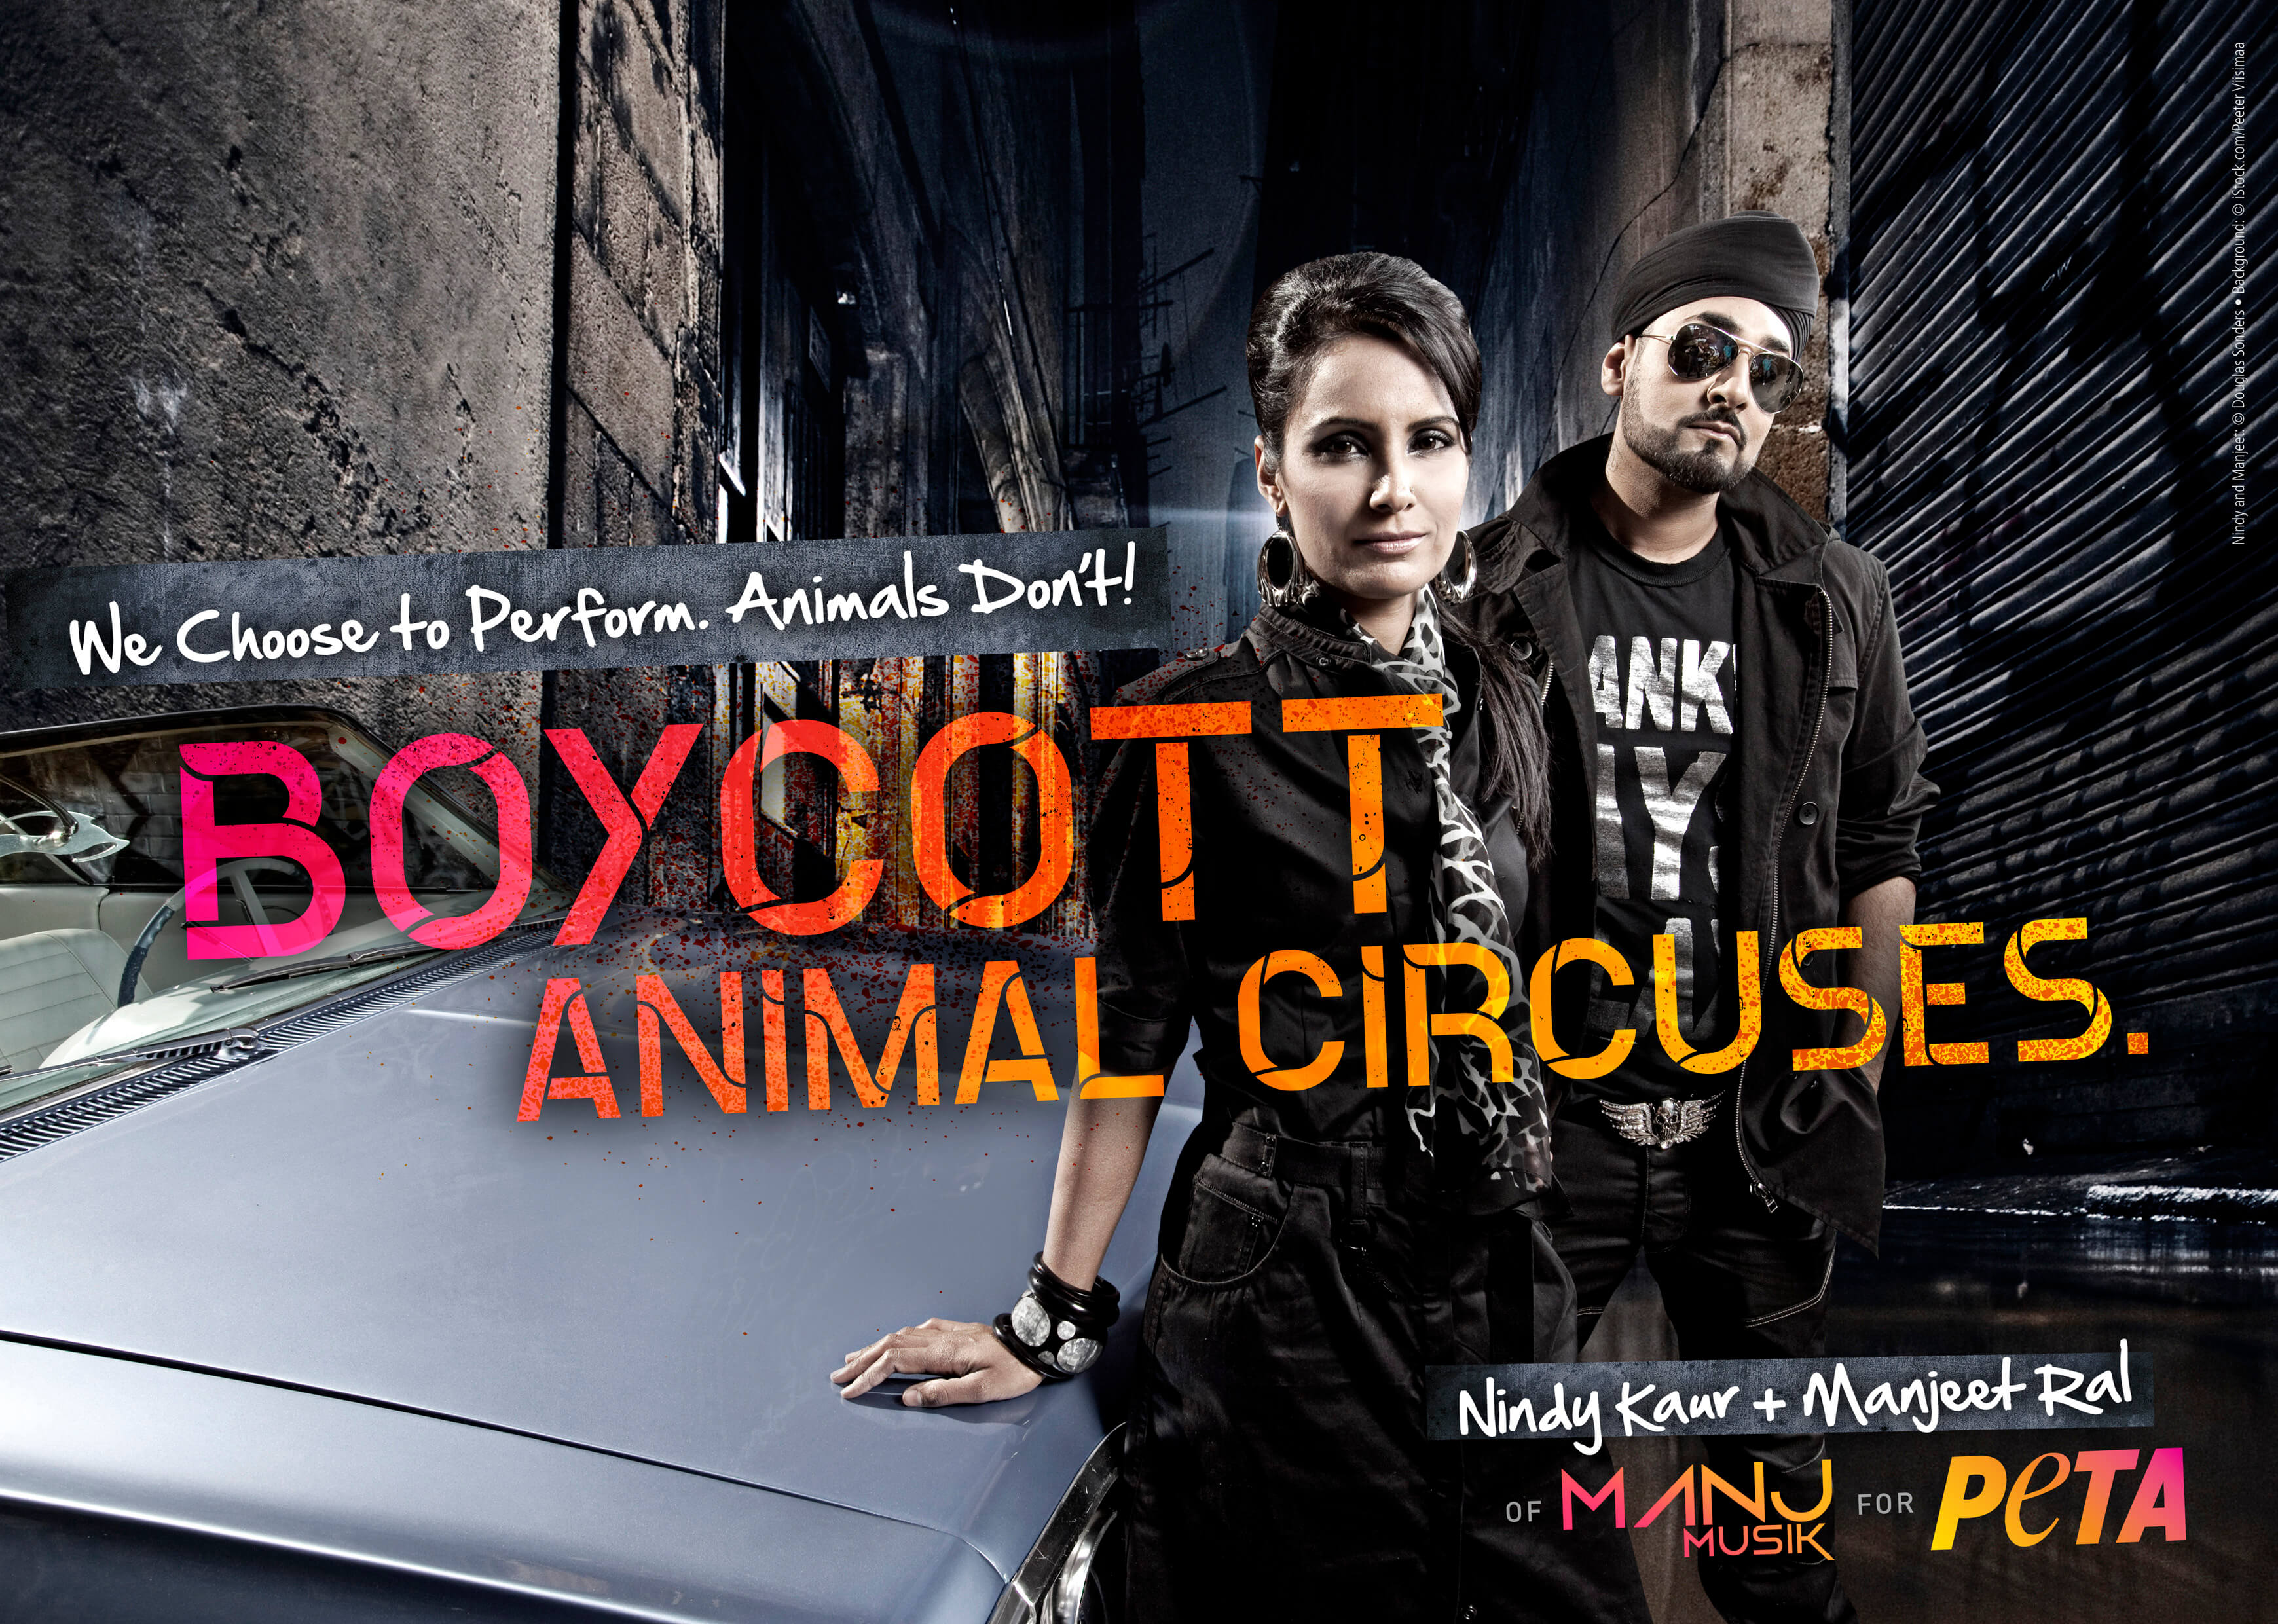 MANJ Musik Slams Circuses for Abusing Animals